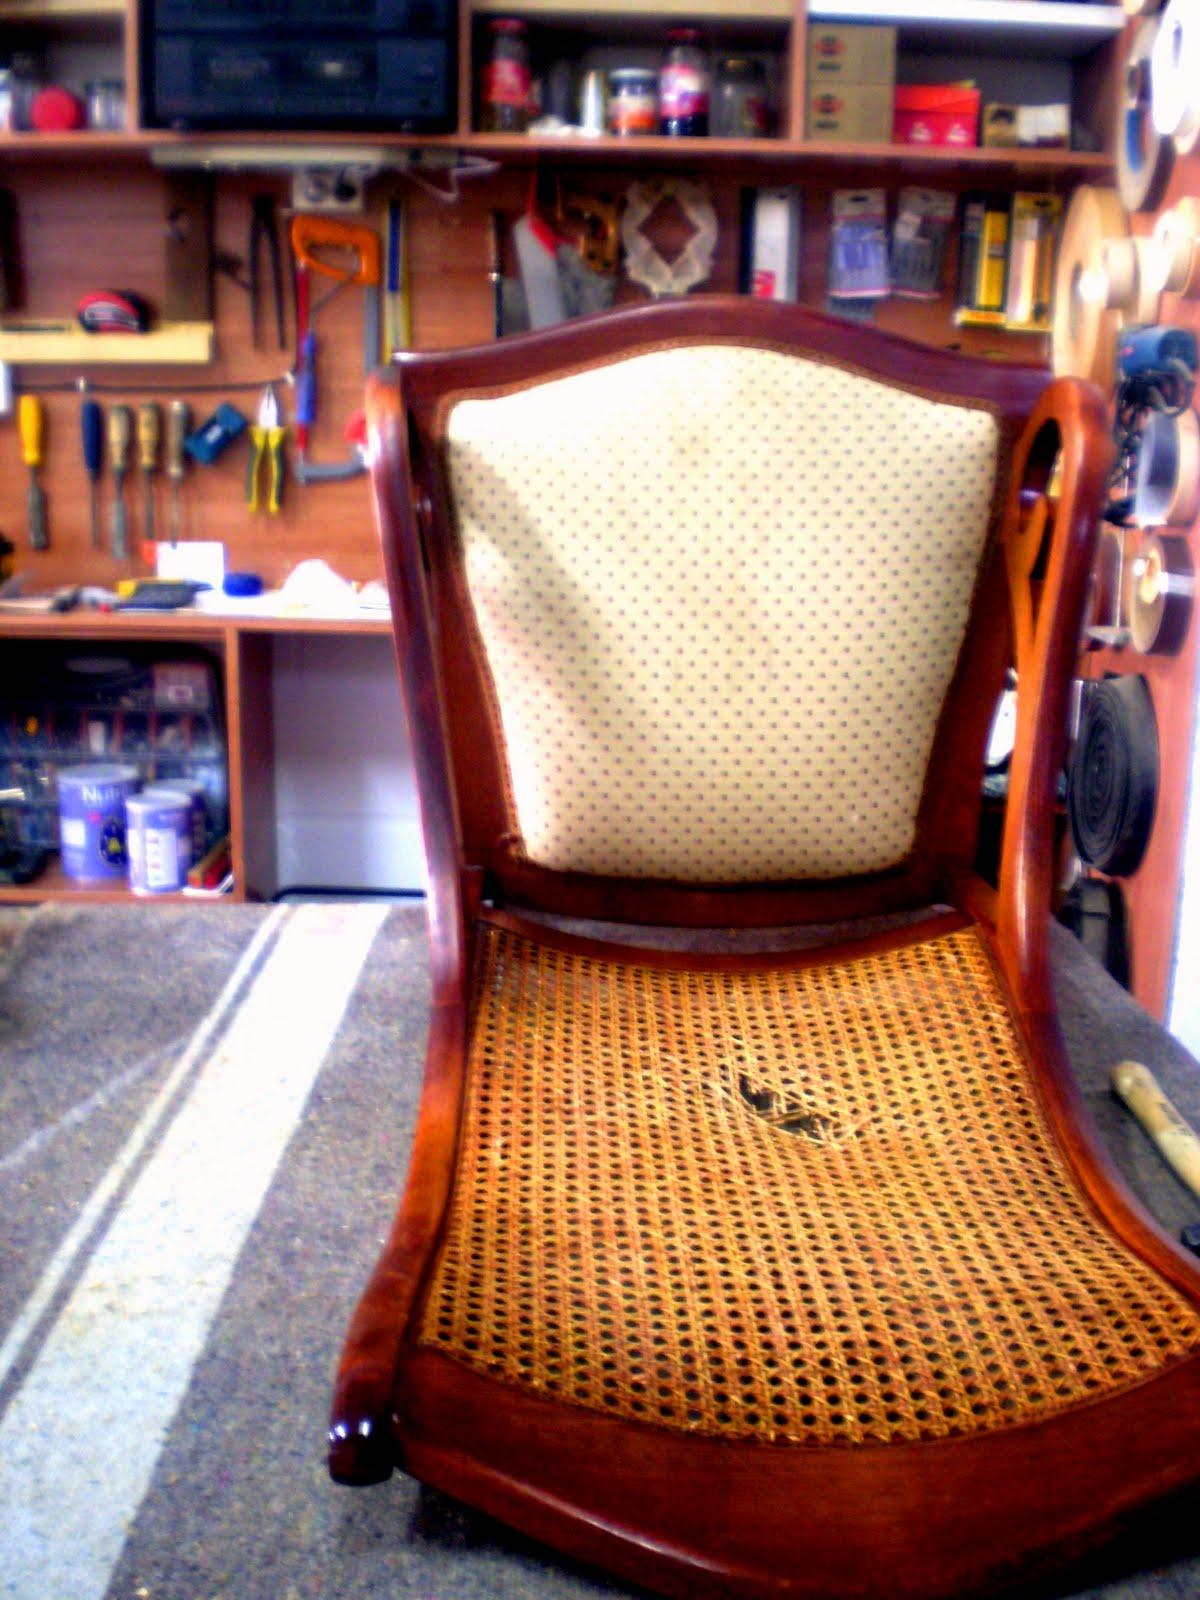 Restauracion muebles curso de restauracion de muebles - Tecnicas de restauracion de muebles ...